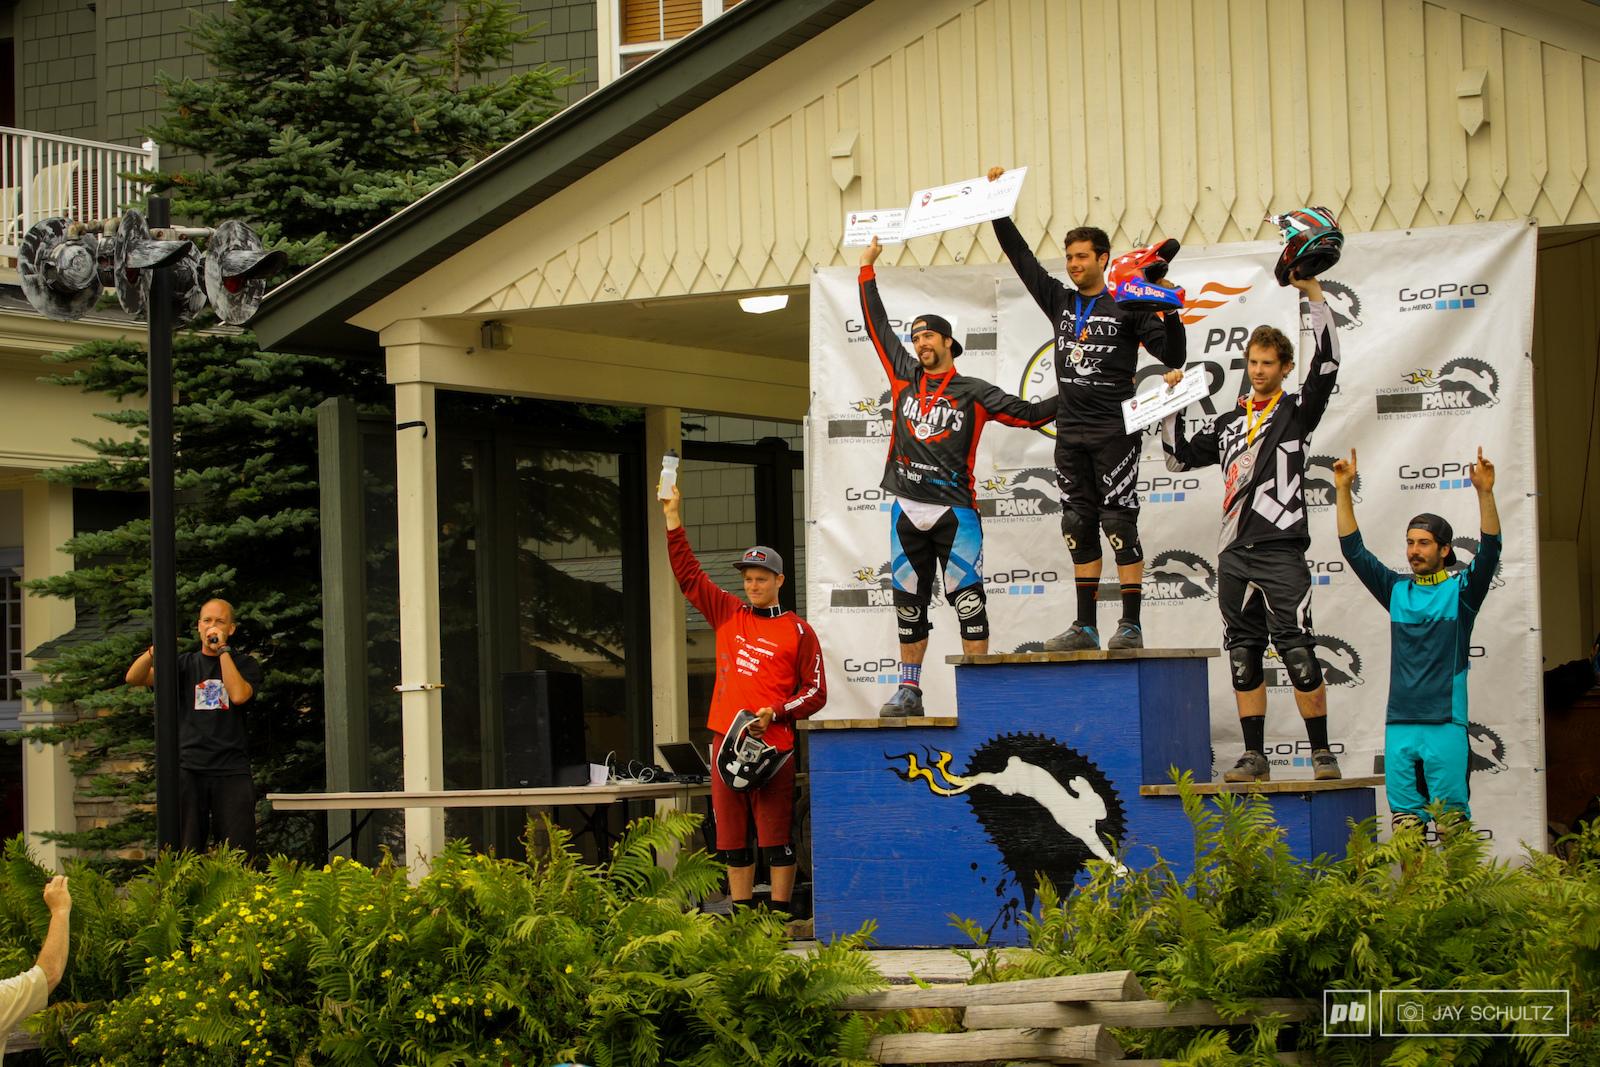 Men s Pro Podium - Gold - Neko Mulally 03 17.9 Silver - Phil Kmetz 03 18.2 Bronze - Kiran MacKinnion 03 18.3. 1 second split the top five That s racing